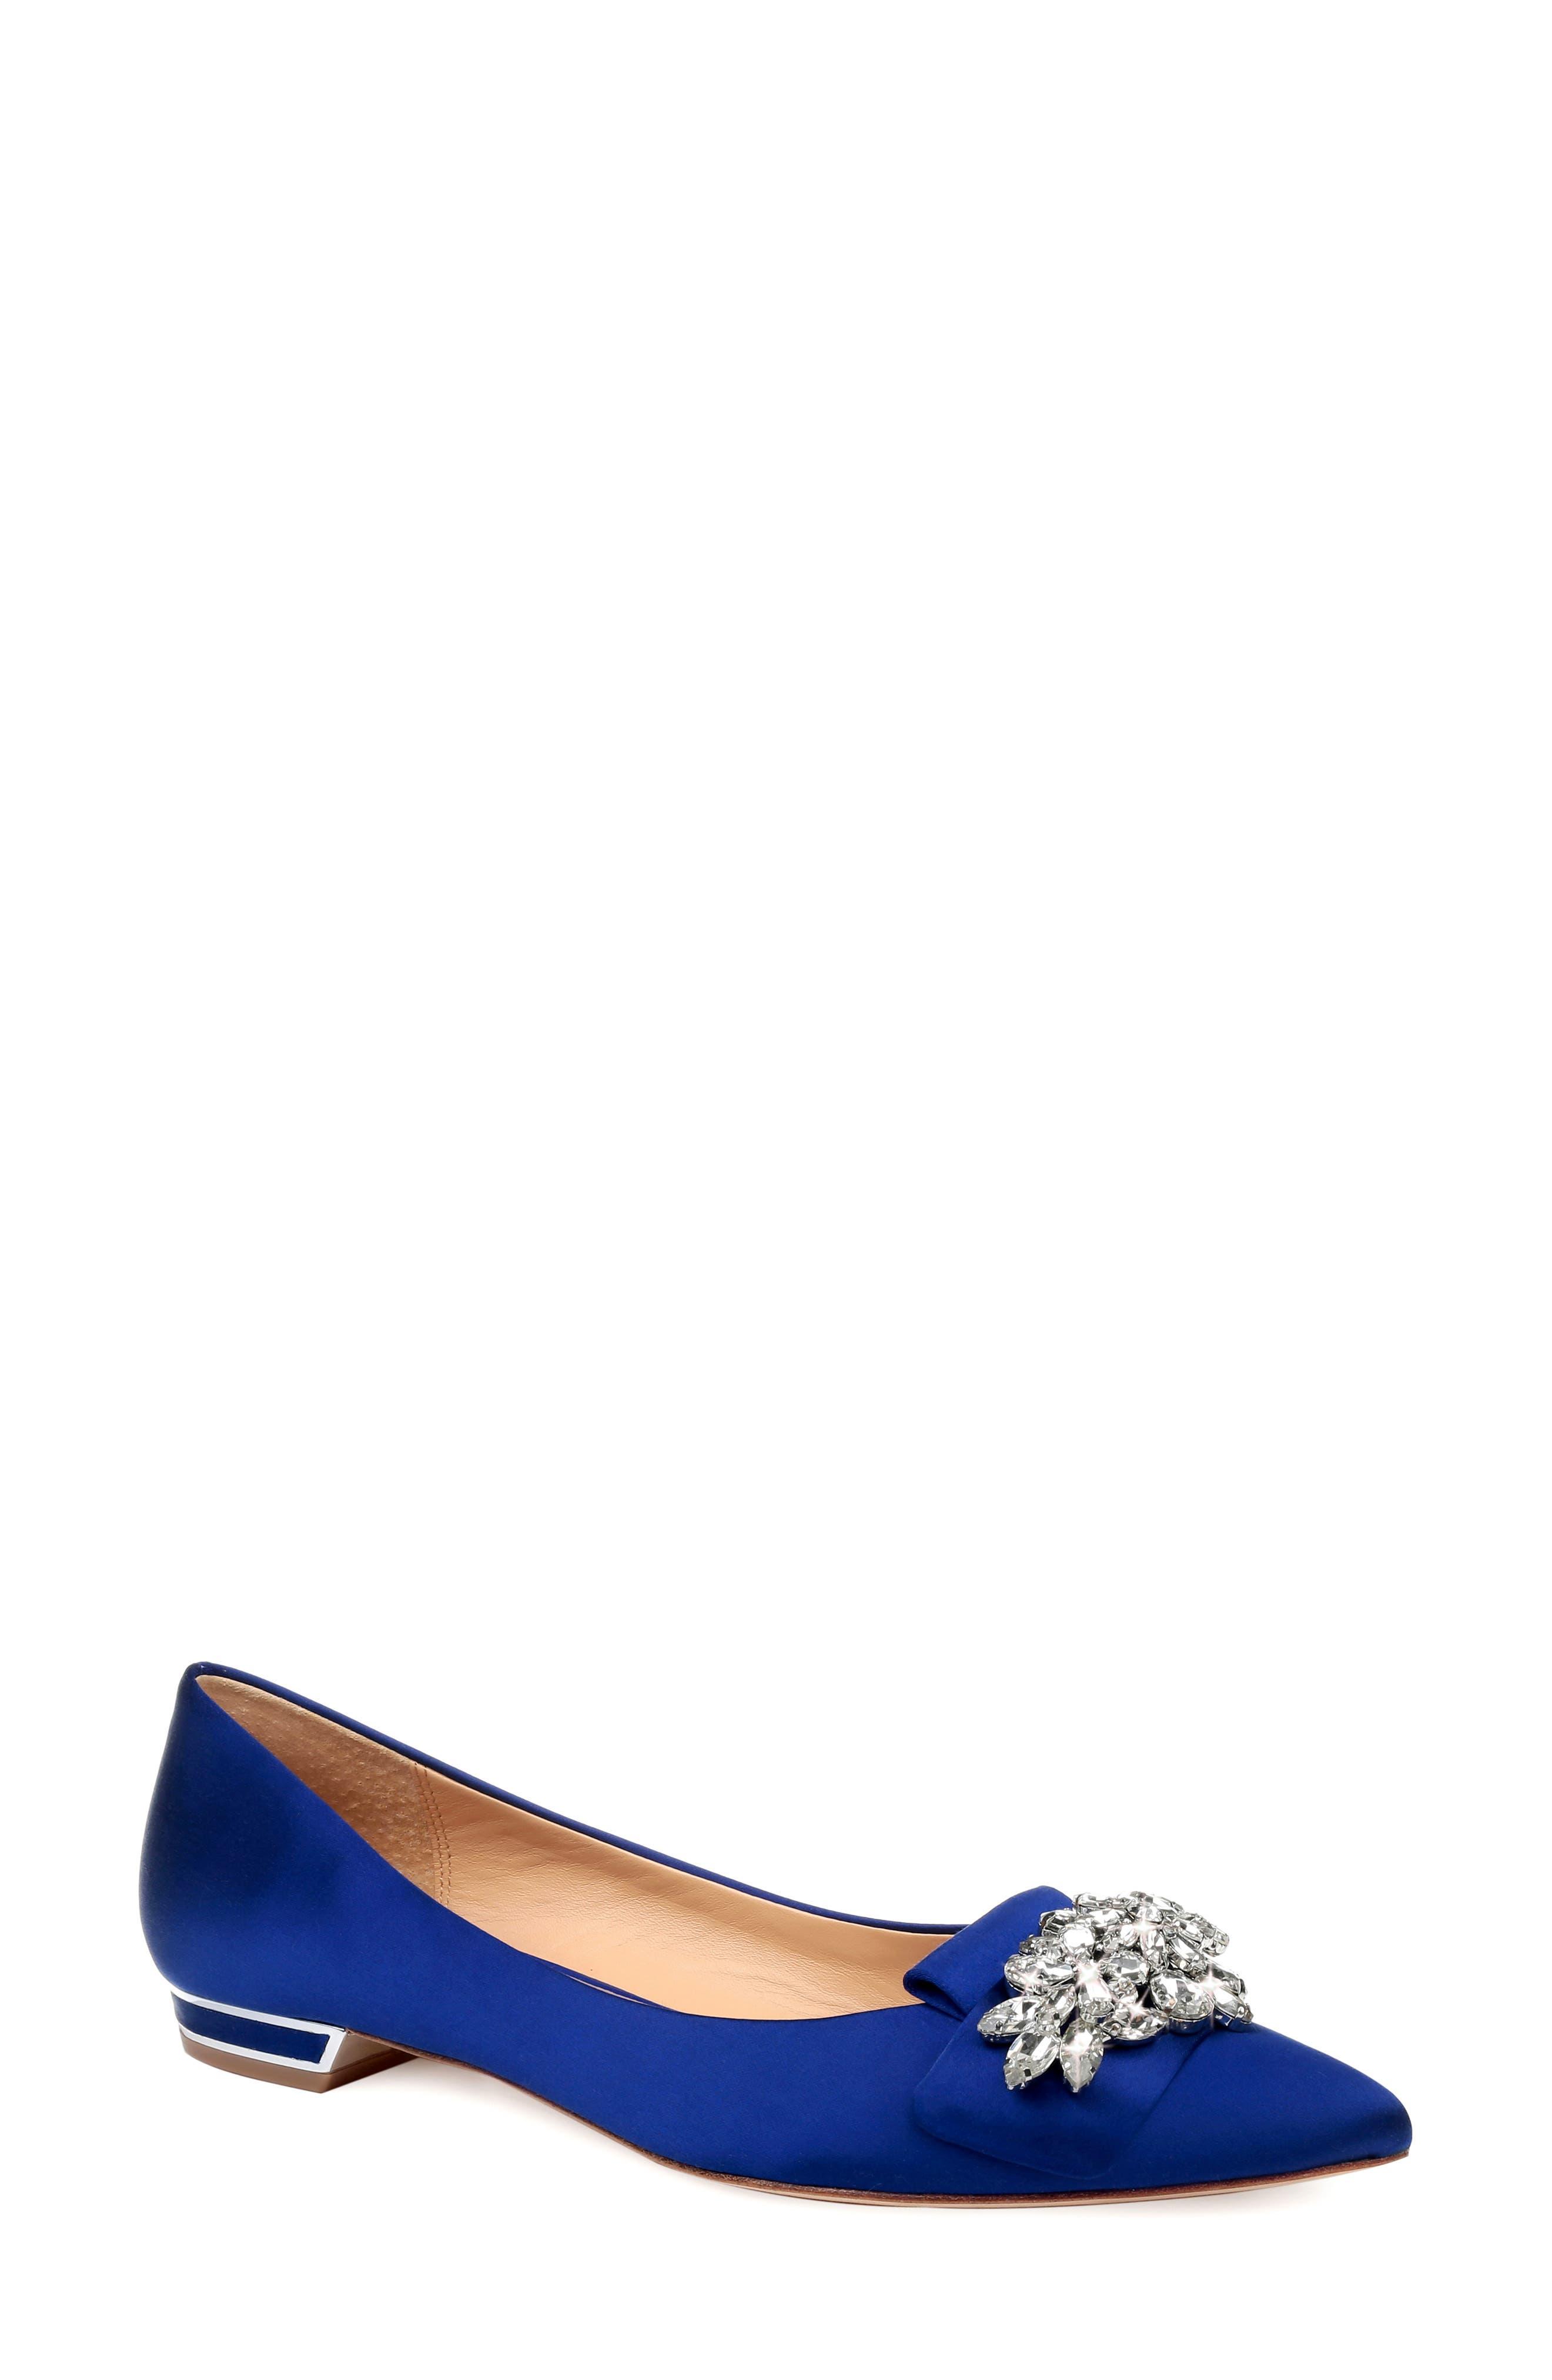 Badgley Mischka Valeria Crystal Embellished Flat, Blue